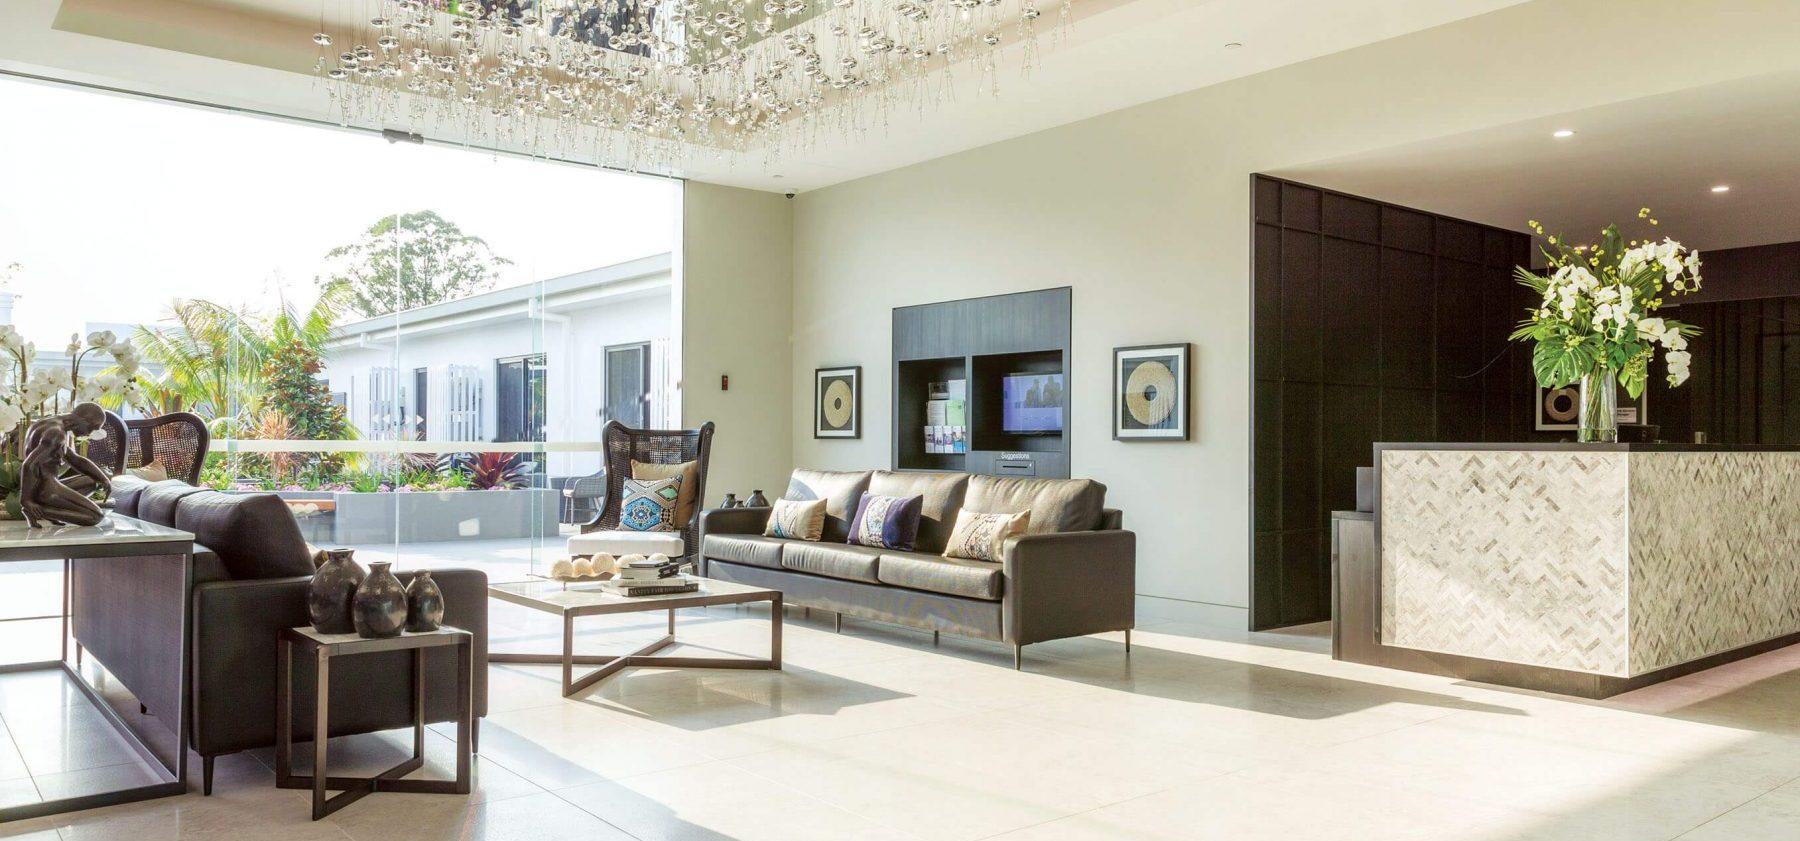 Arcare Parkwood Interior Foyer